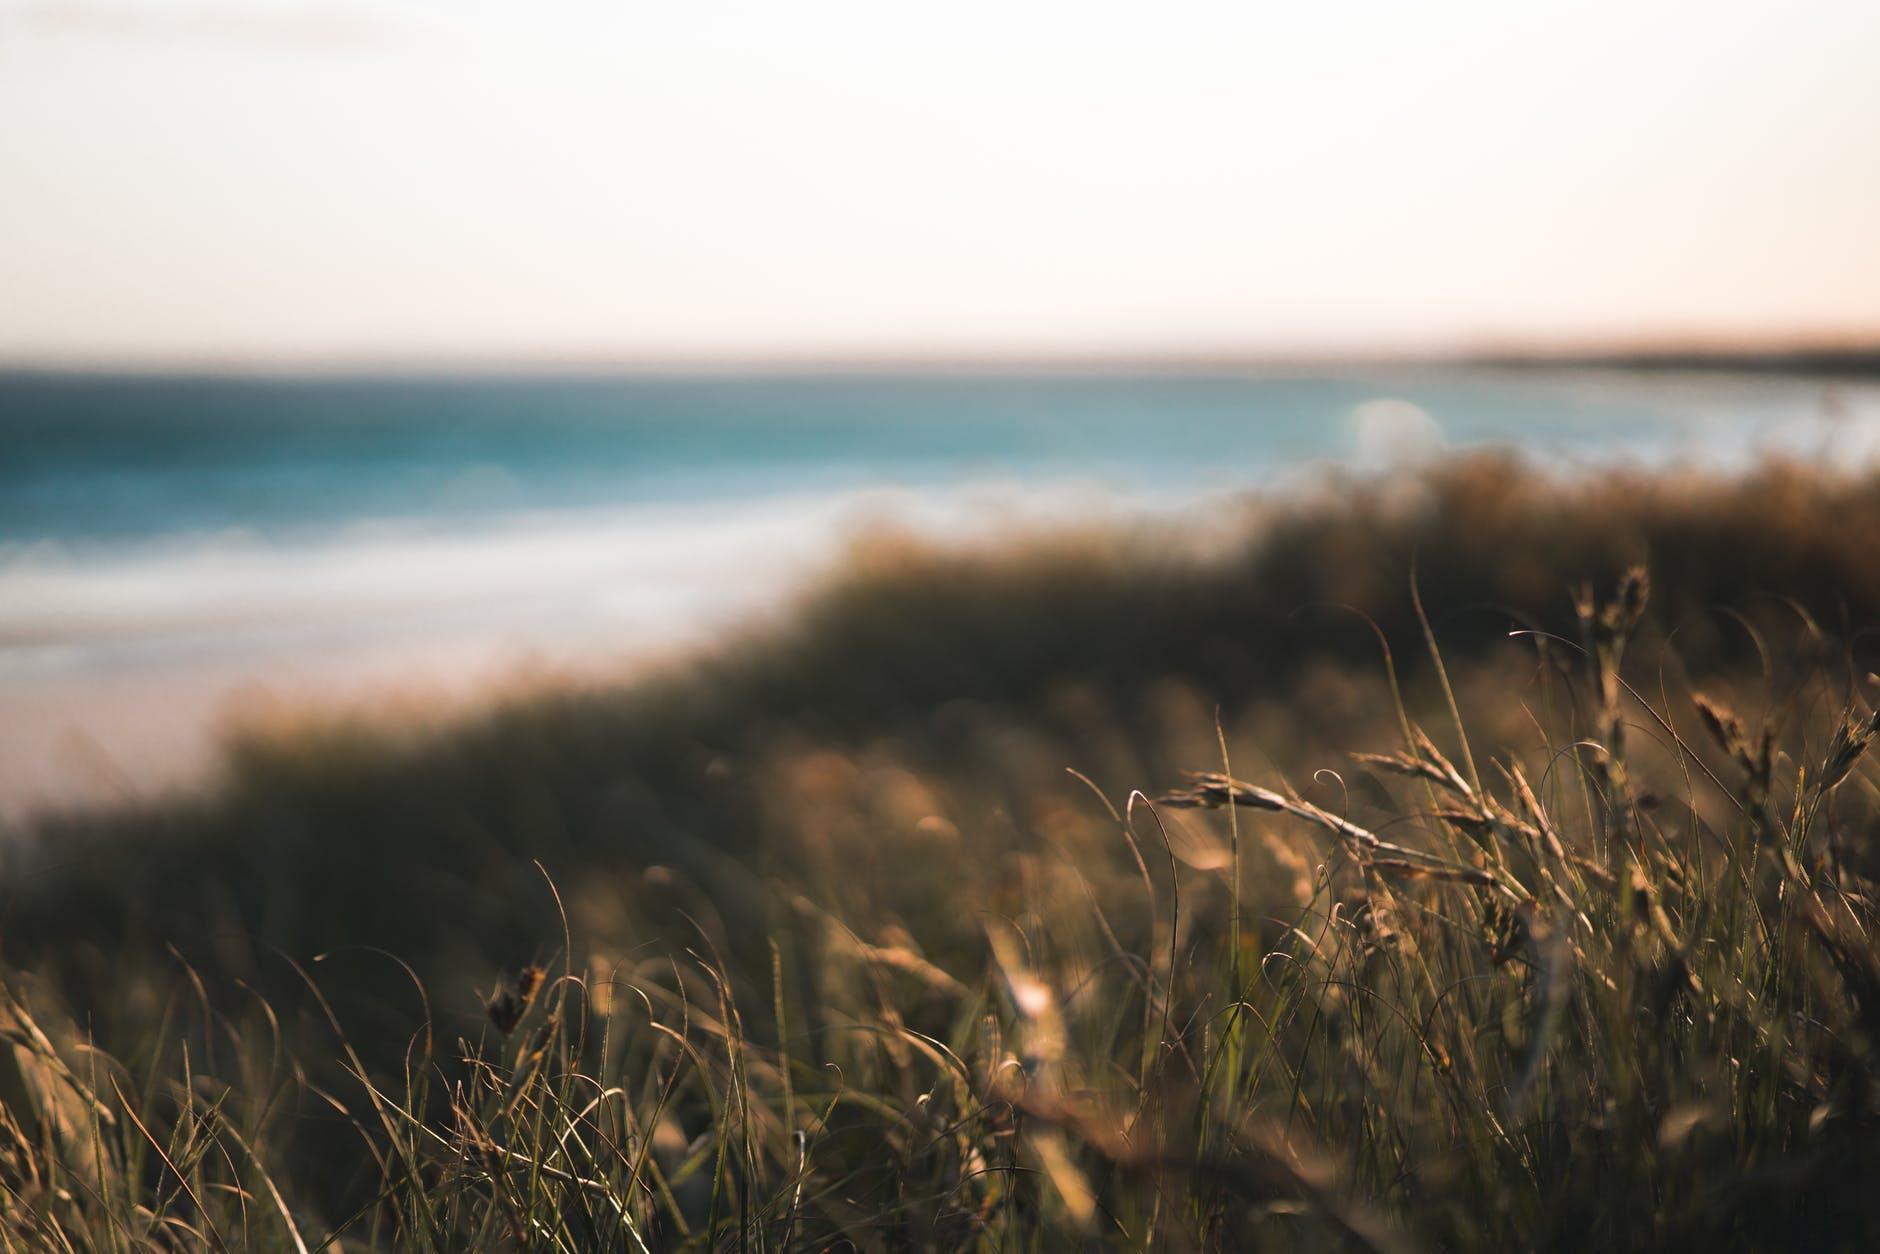 dry grass growing near seashore on warm sunny day